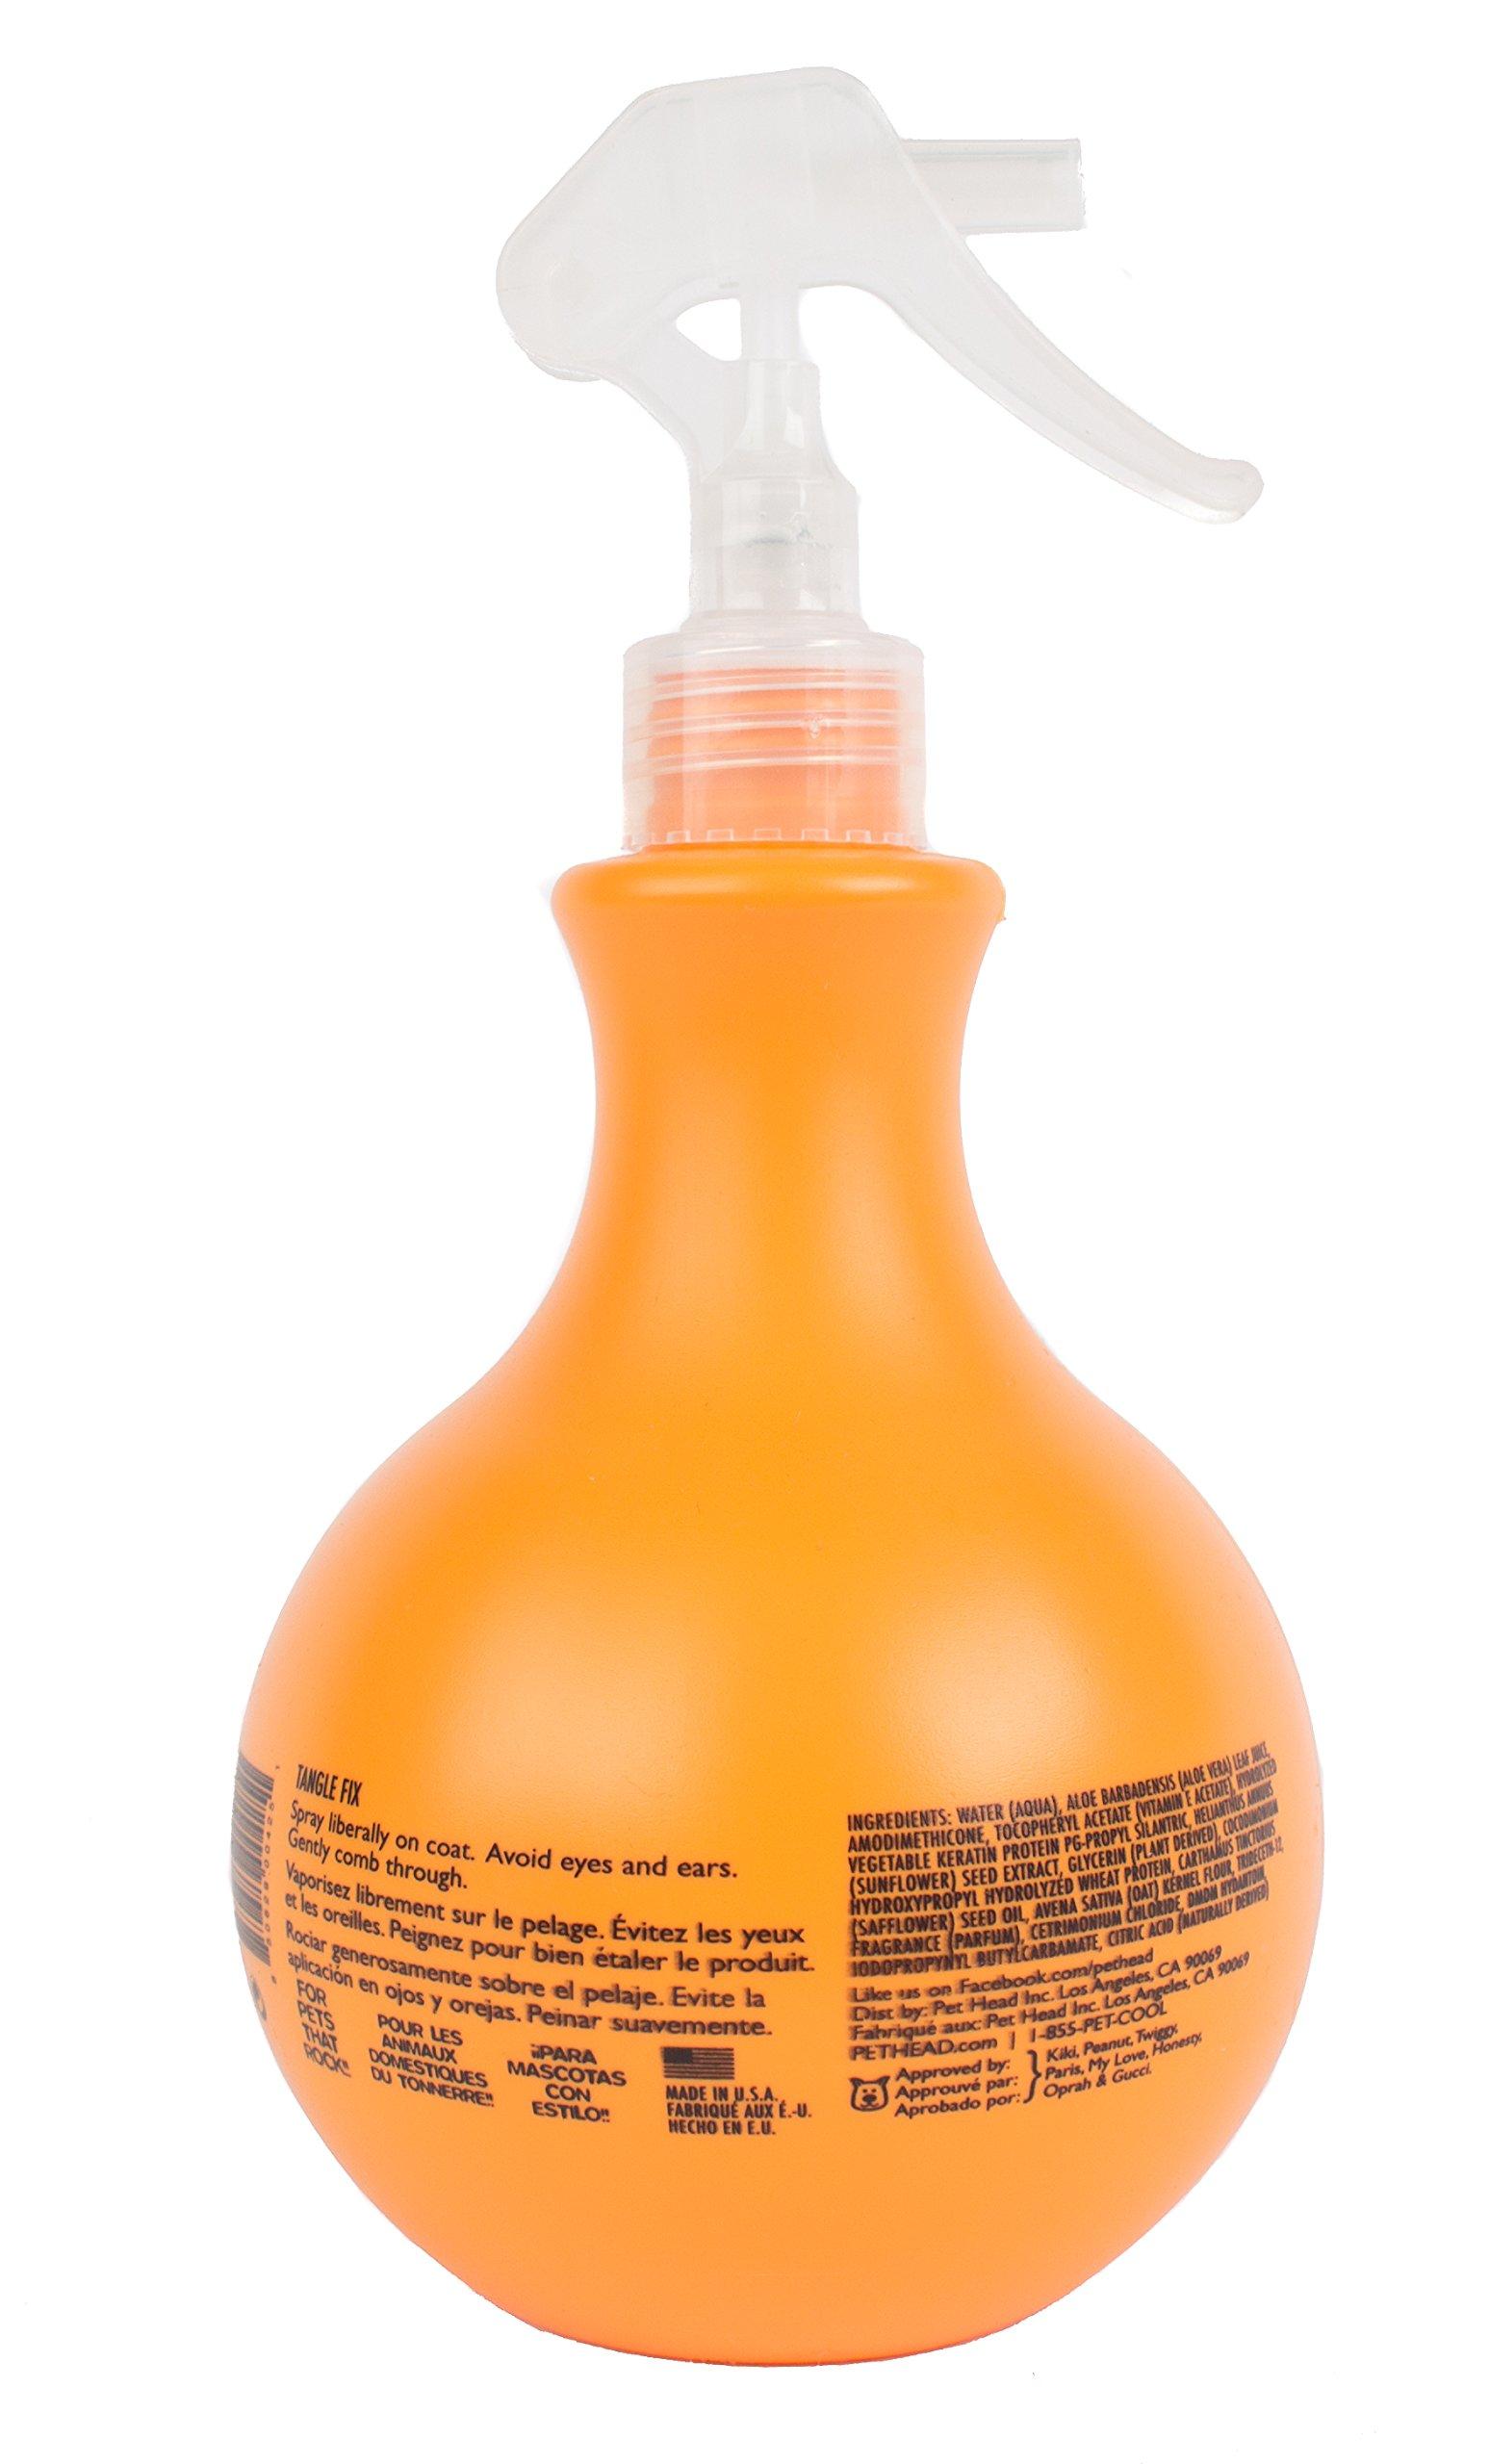 Pet Head Fur Ball Detangling Spray for Pets Strawberry Yogurt -- 15.2 fl oz by The Company of Animals (Image #3)